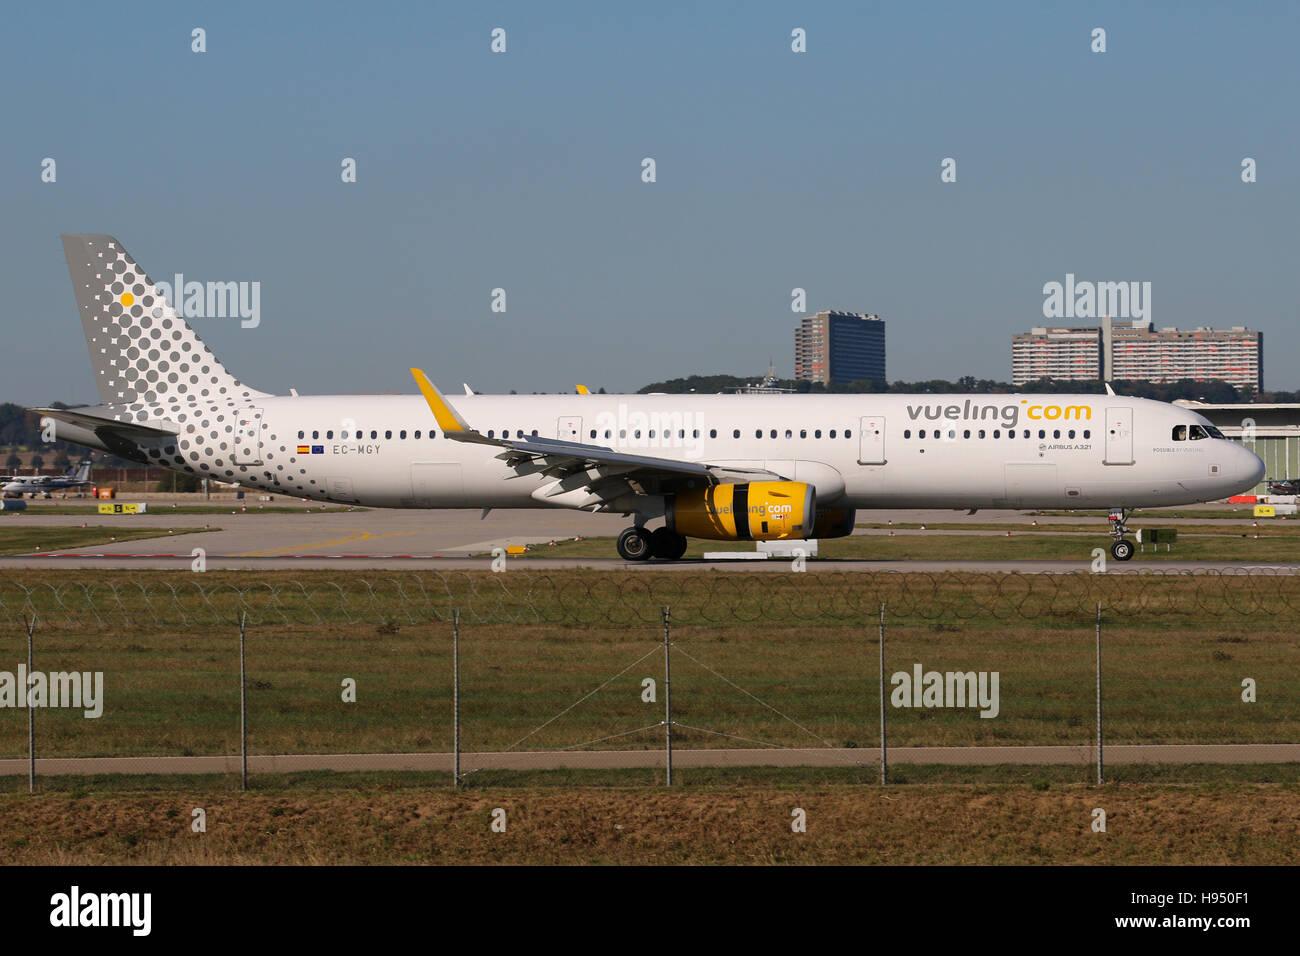 Stuttgart, Germany – October 16, 2016: Vueling, Airbus A321 at Stuttgart Airport - Stock Image